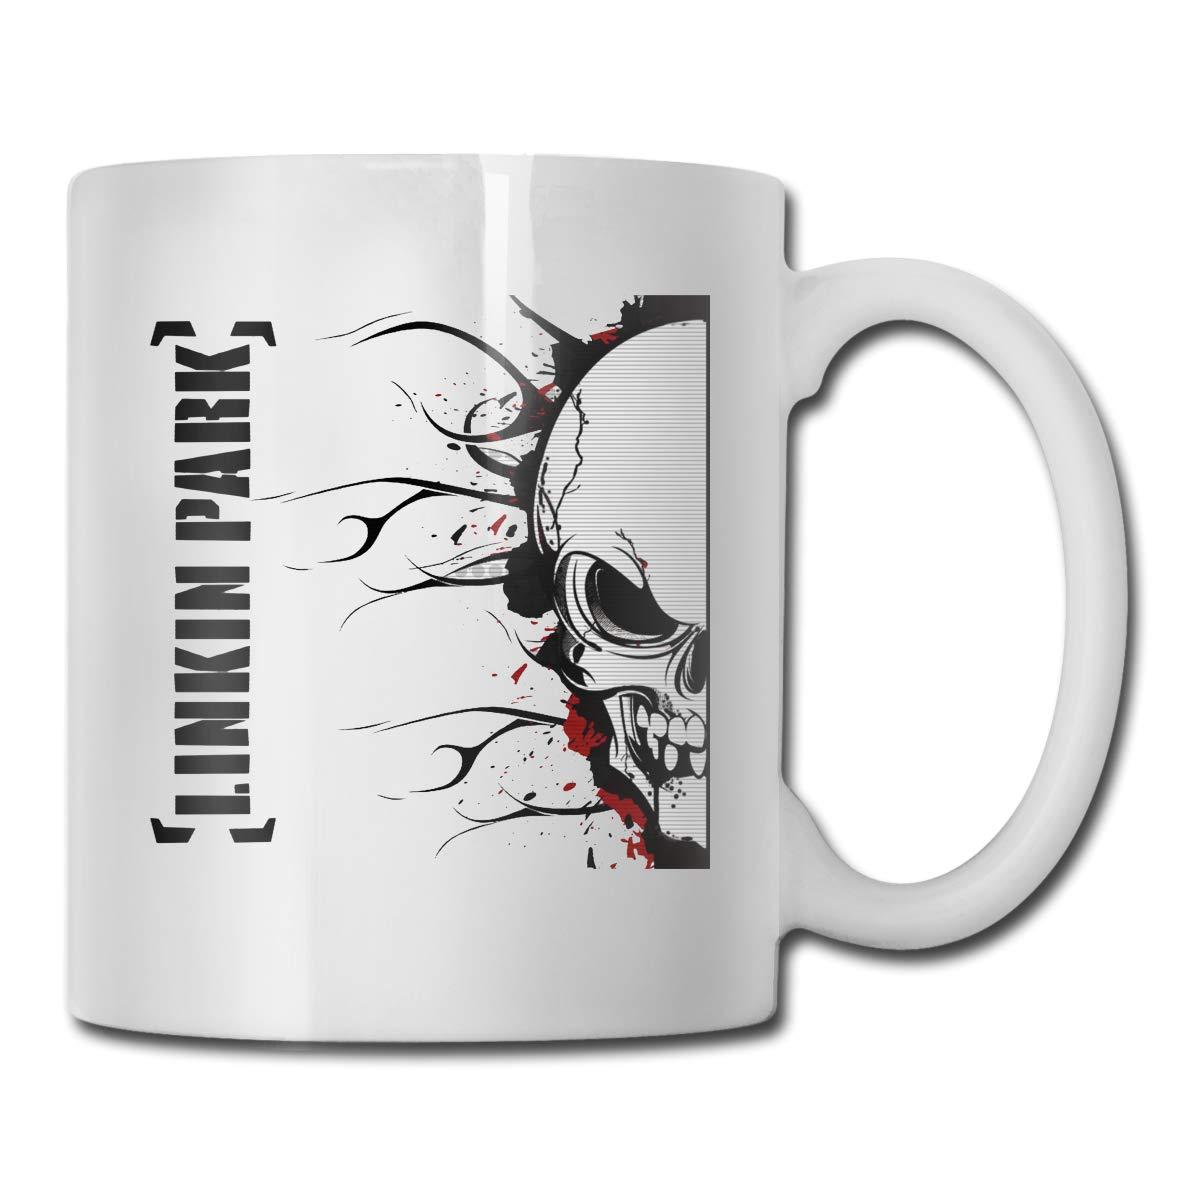 Office Coffee Cup LinkinParkArt Geblackus 14.72 OZ Capacity Mug is Perfect for CoffeeWhite